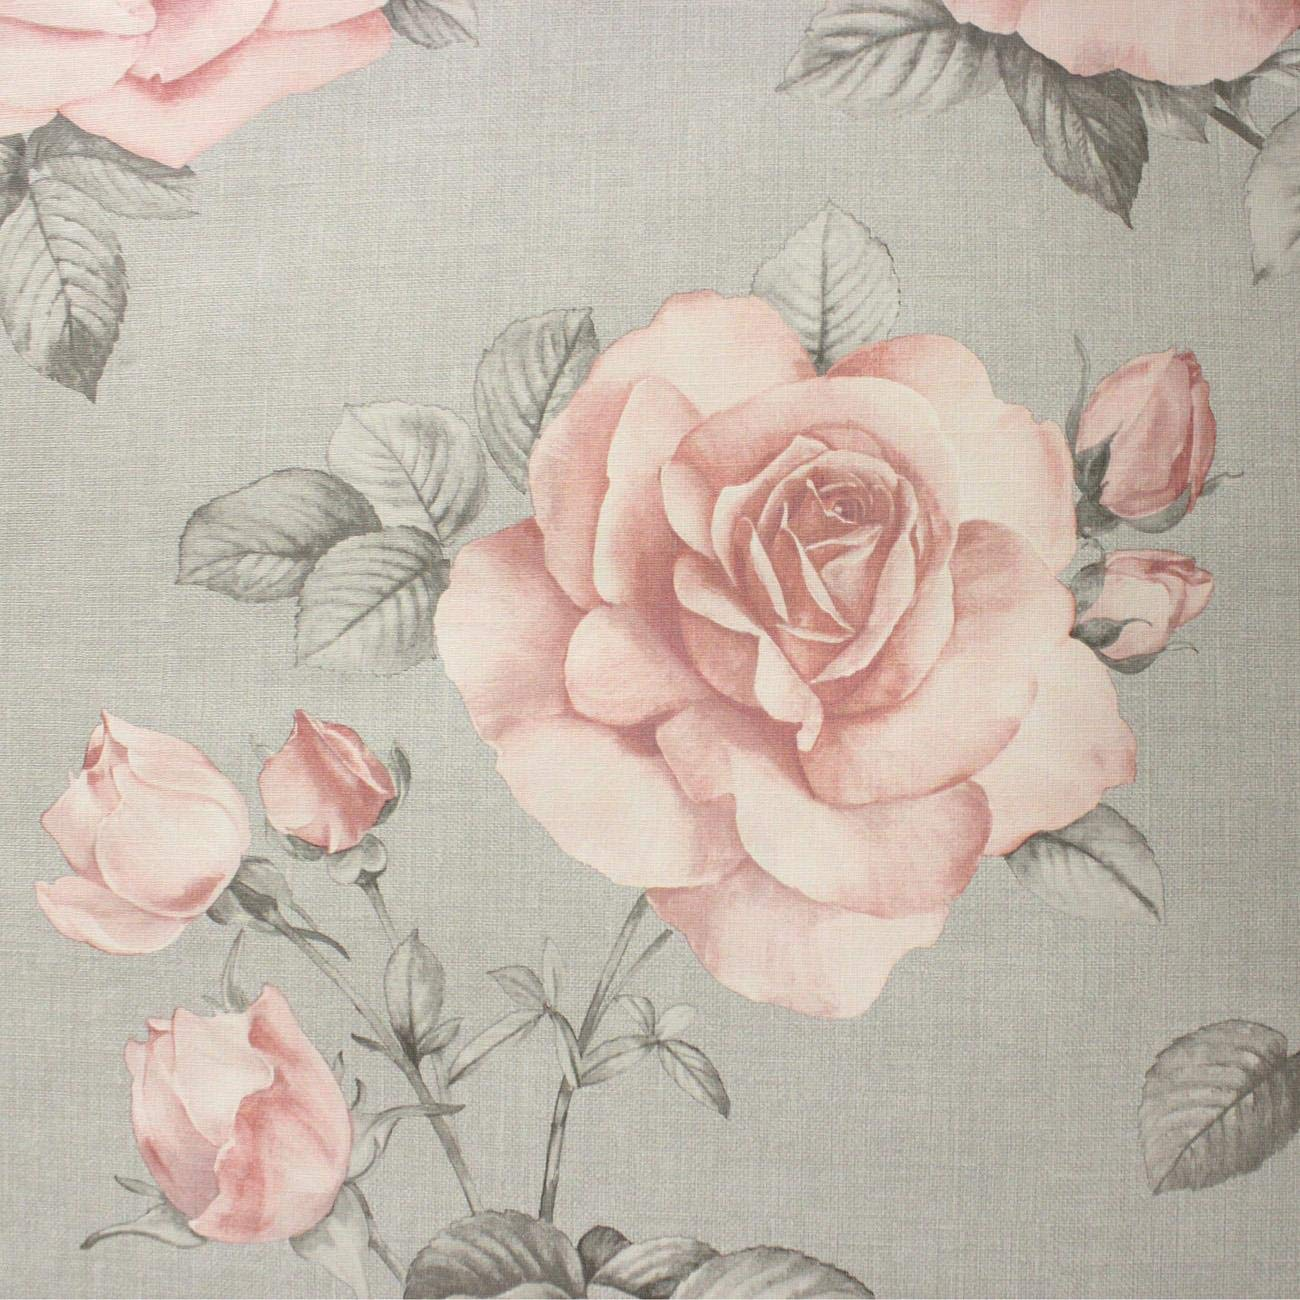 Floral Flower Roses Wallpaper Pink Grey Hessian Linen Effect